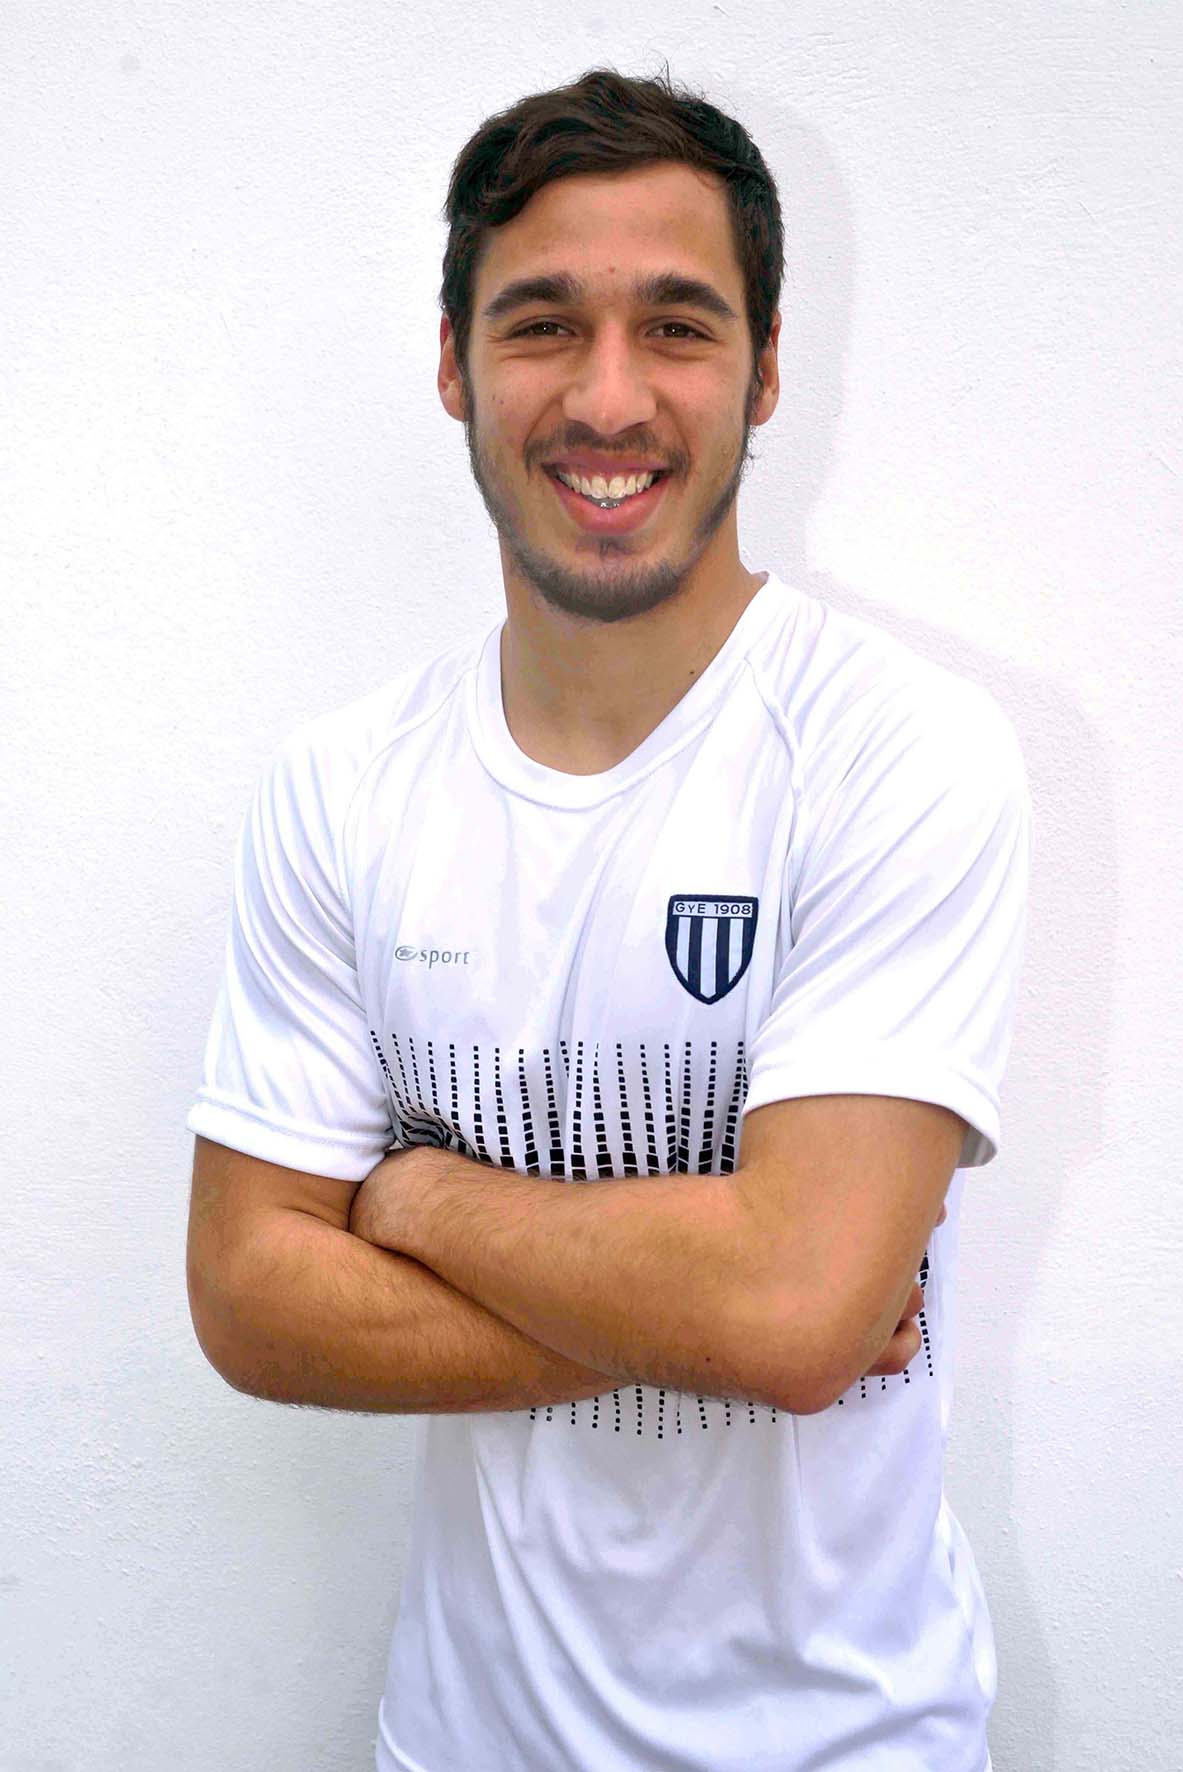 Santiago Dominguez